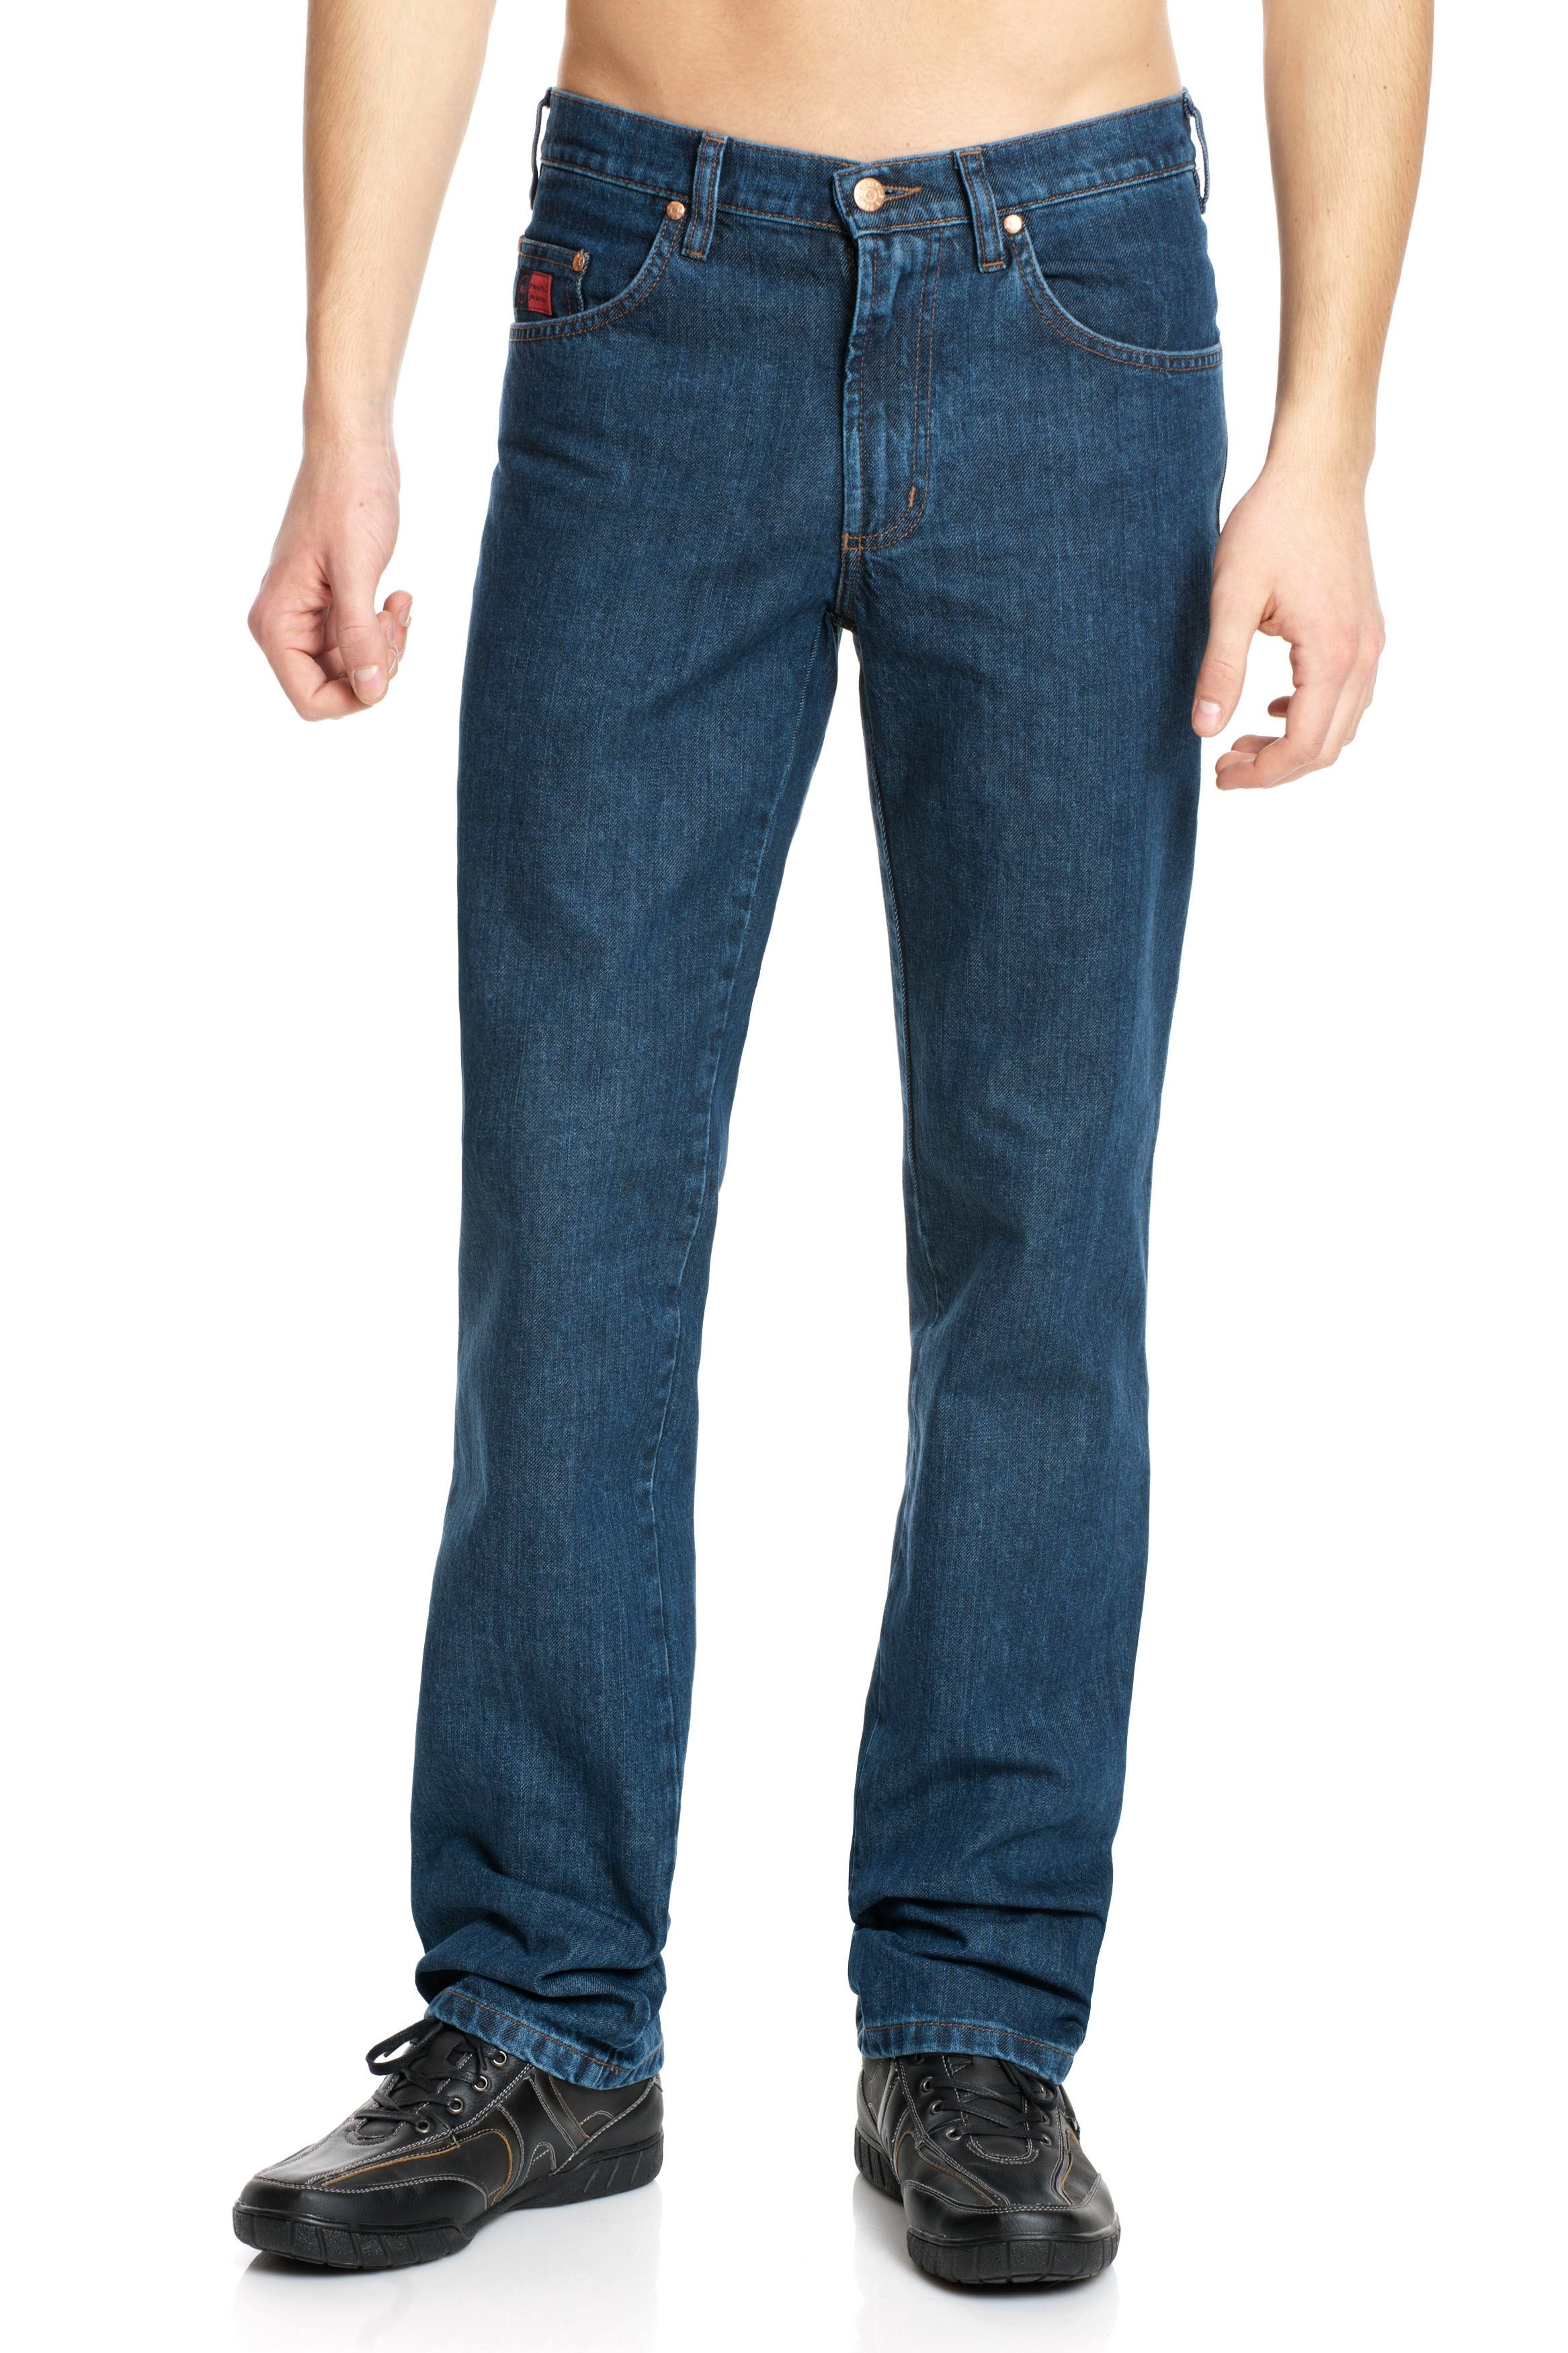 Revils Jeans 302 stonewash extra lang